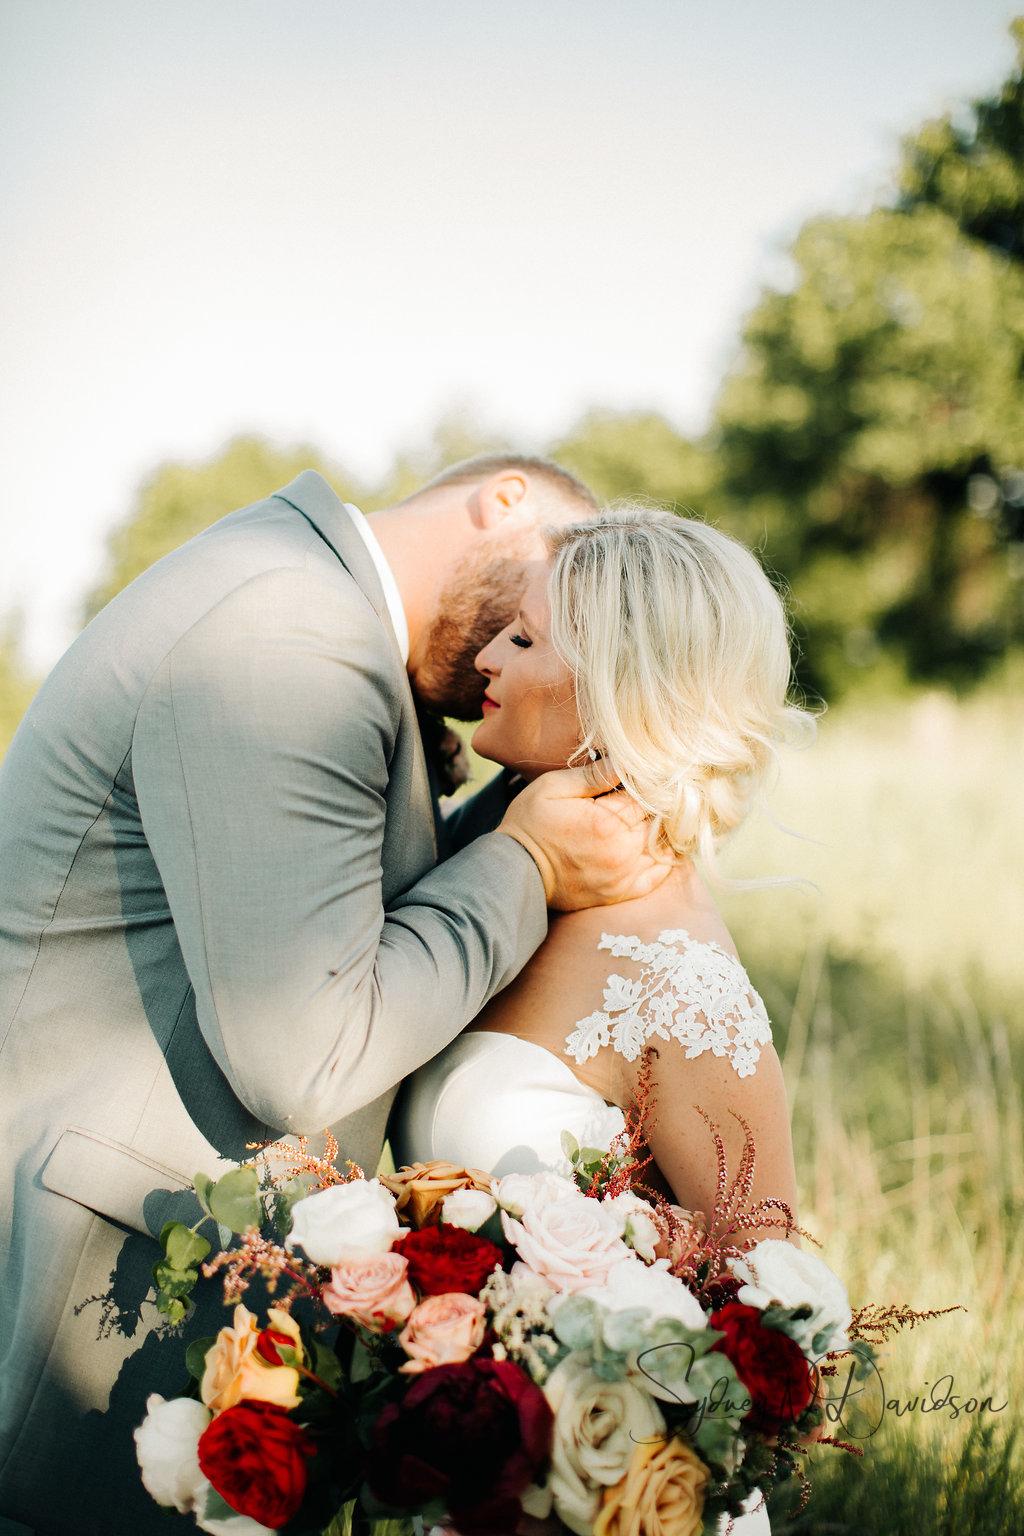 sydney-davidson-wedding-stillwater-oklahoma-wedding-session-traveling-photographer-portrait-tulsa-oklahoma-3802.jpg